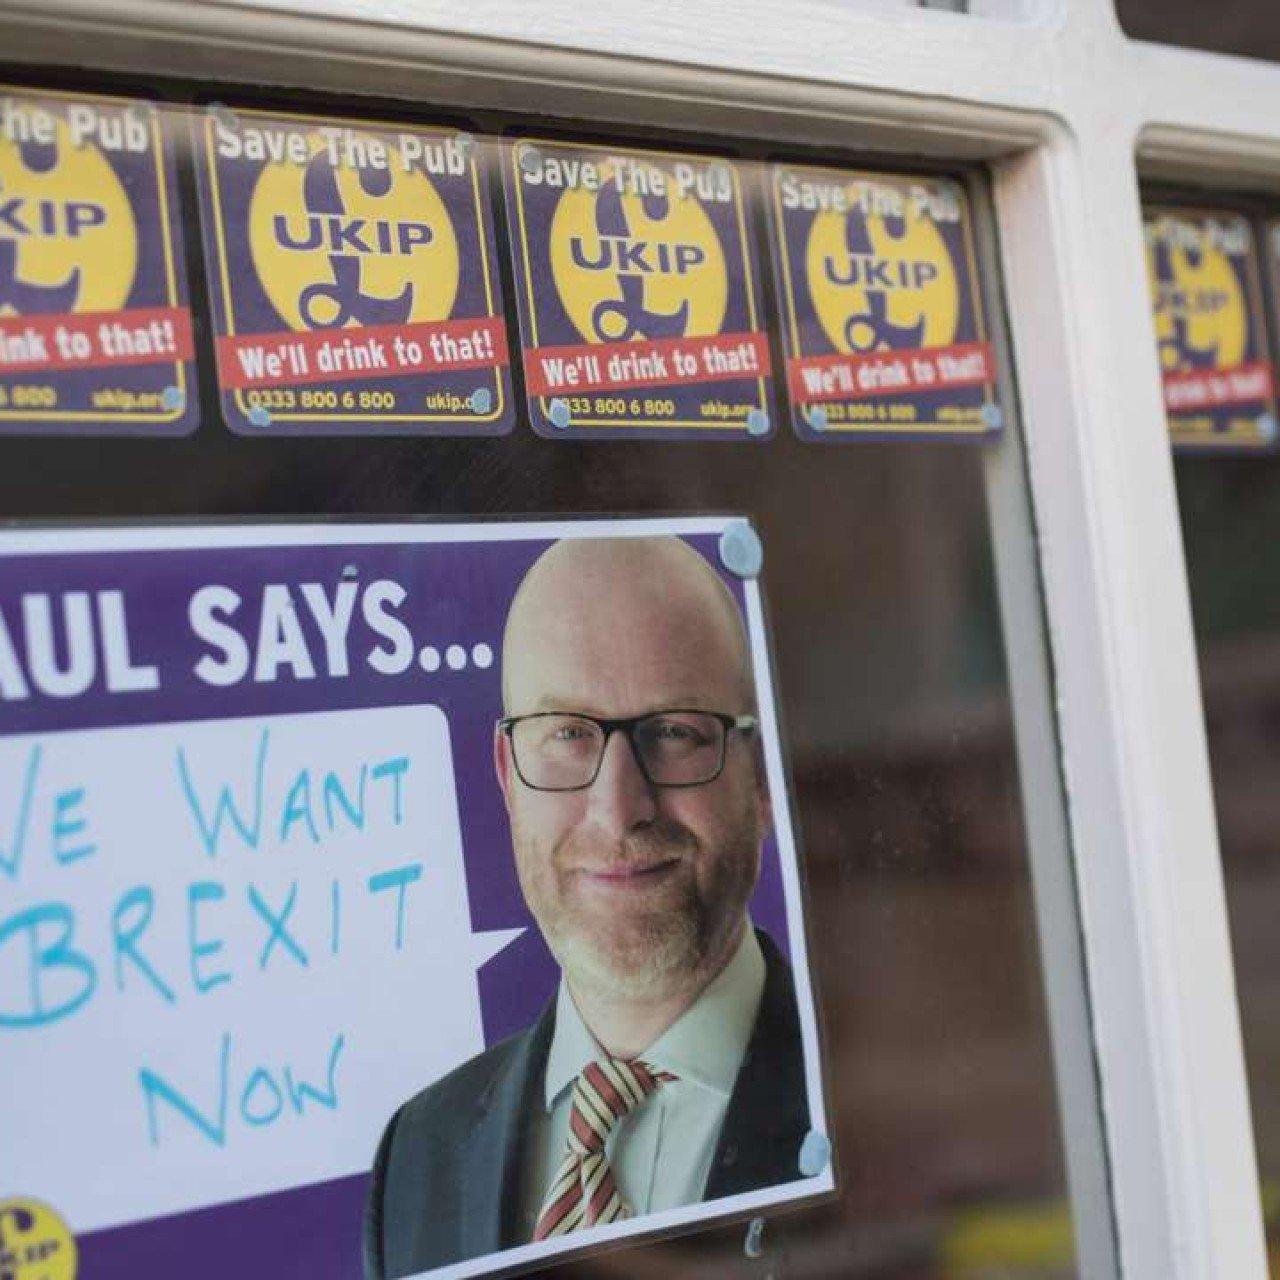 Archbishop of Canterbury lumps Trump win, Brexit 'in fascist